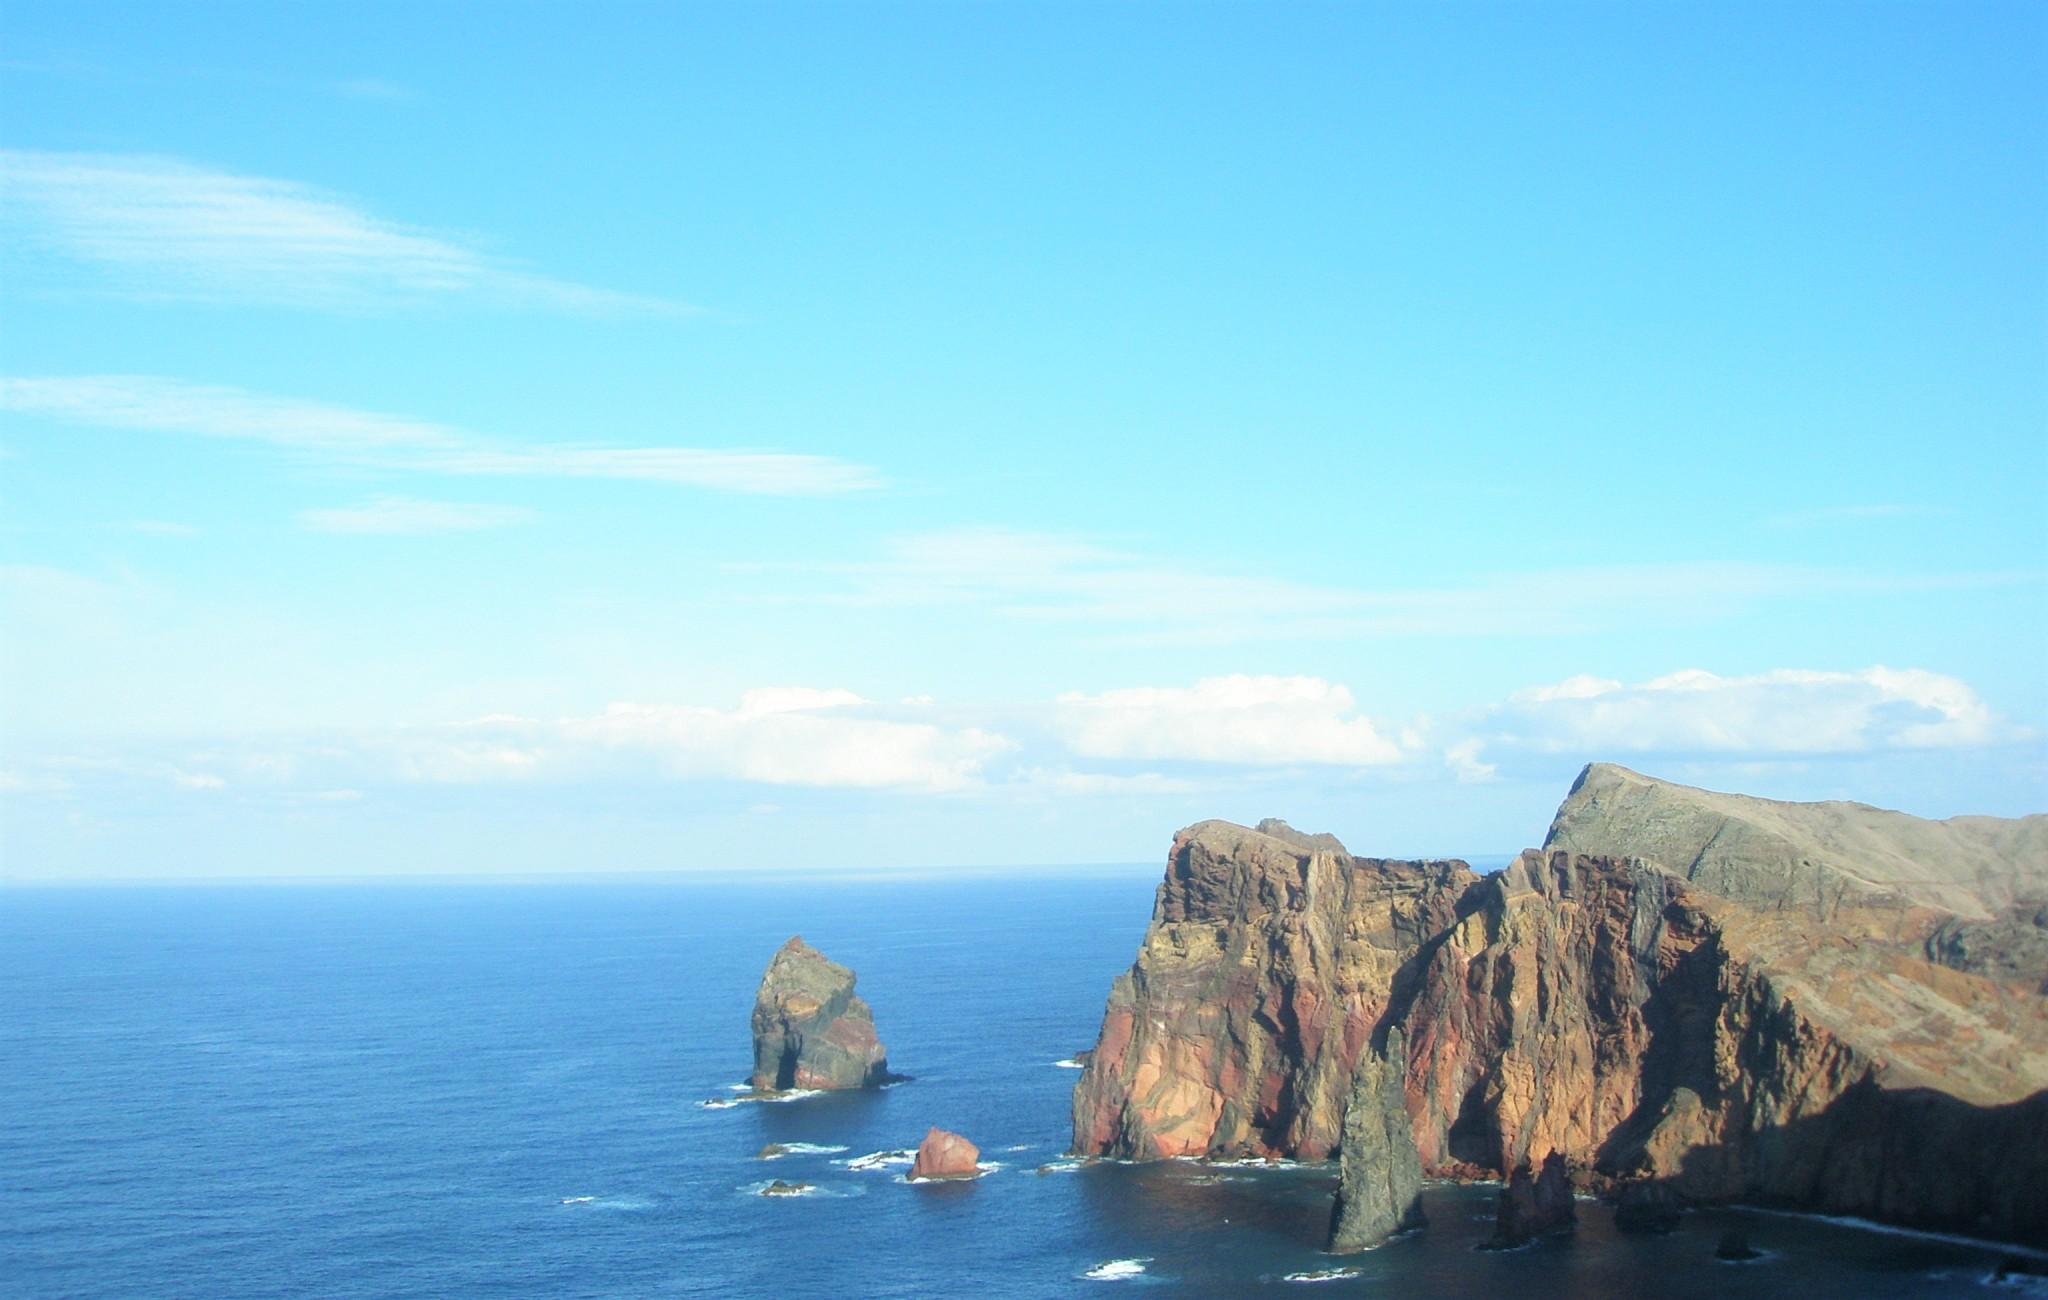 okean-vostochnoe-poberezhe-madejry